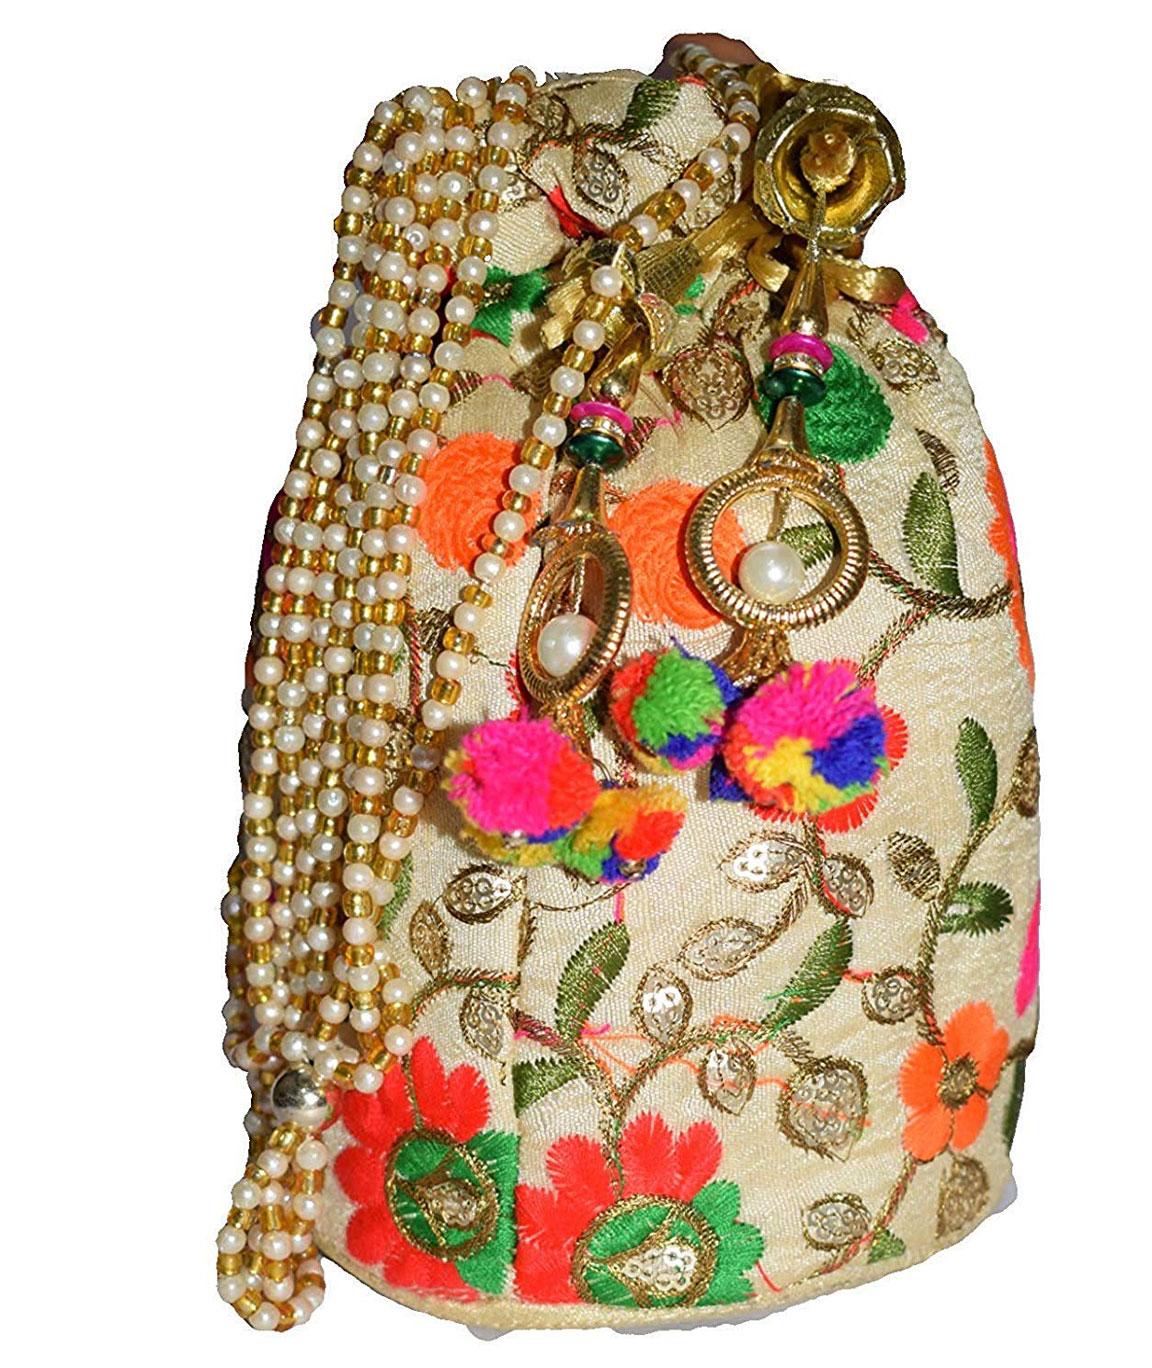 DN Enterprises Fashion House Handmade Designer Embroidered Rajasthani Clutch potli Style Bag for Wom